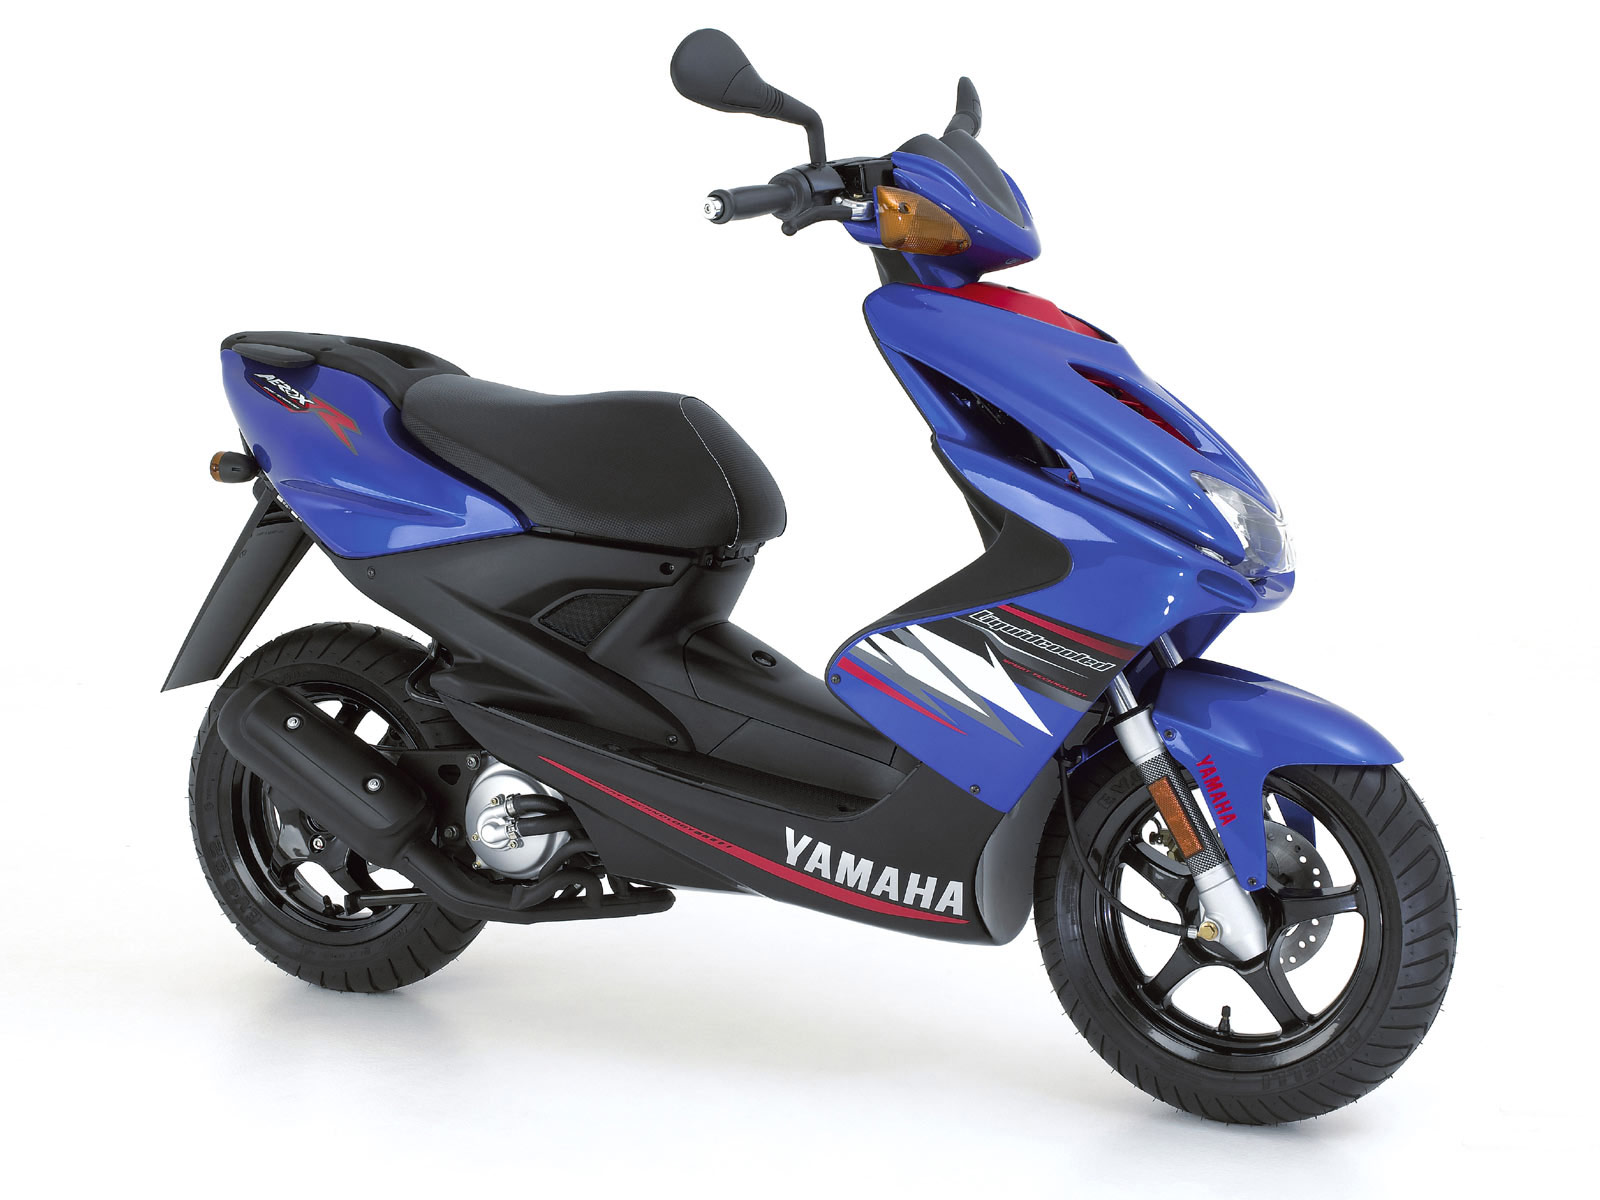 yamaha aerox wiring diagram 2006 subaru impreza headlight yq50 r scooter pictures insurance info